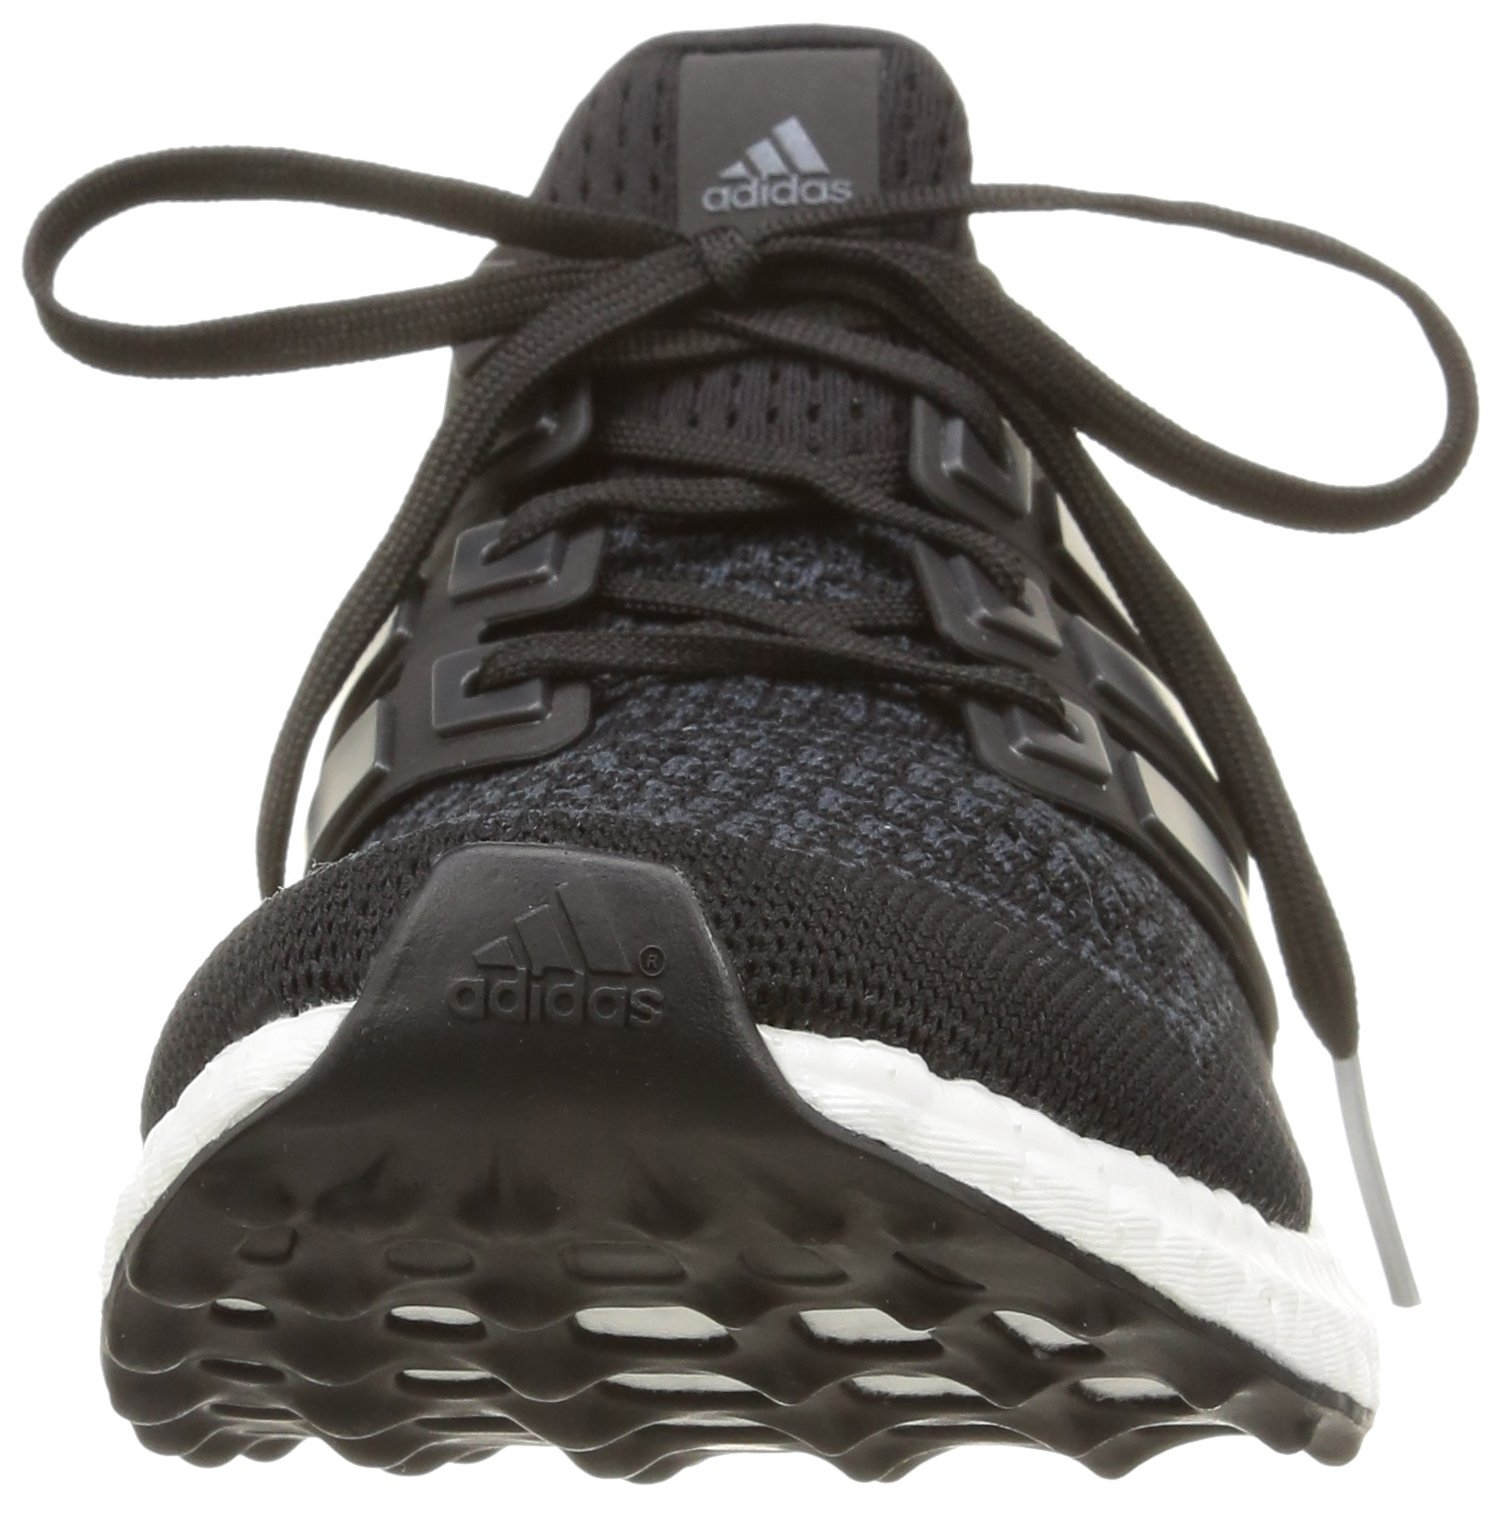 71TGA v4e4L - adidas Ultra Boost, Women's Running Shoes